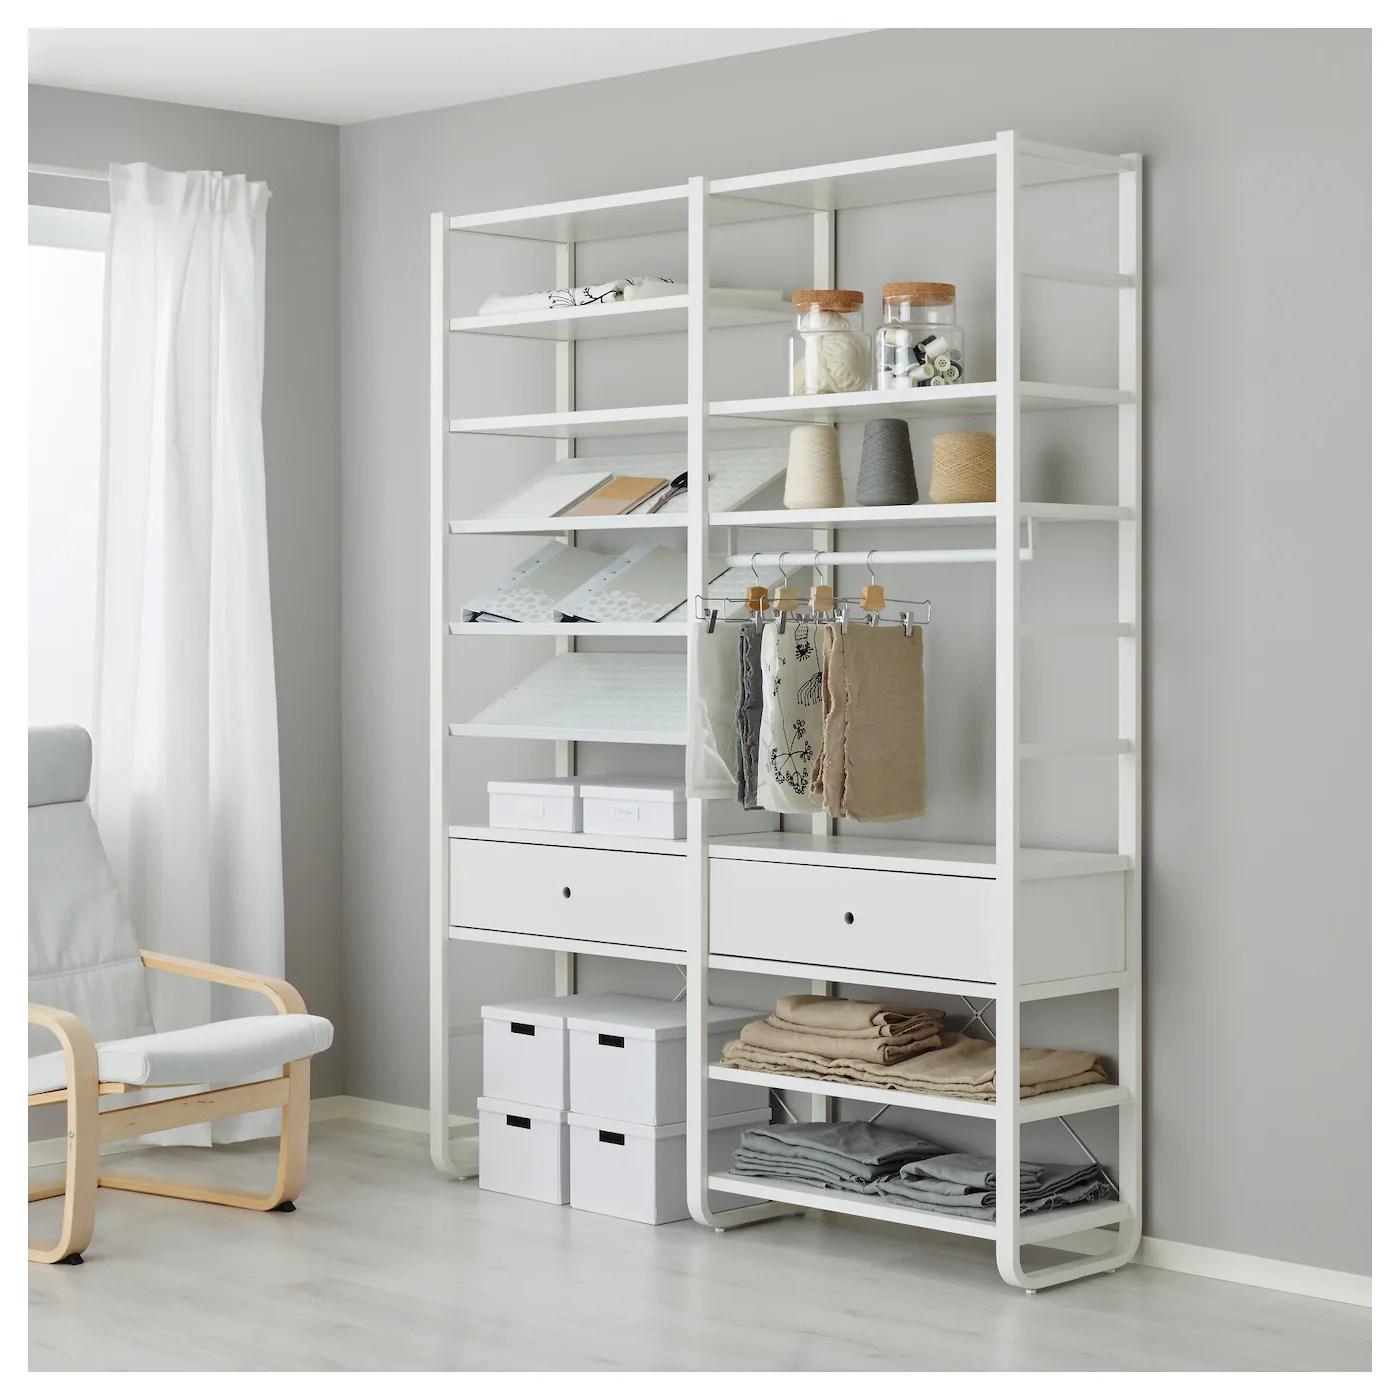 Ikea Küchen Systeme Bestå Combinaison Rangt Tv Vitrines Brun Noir